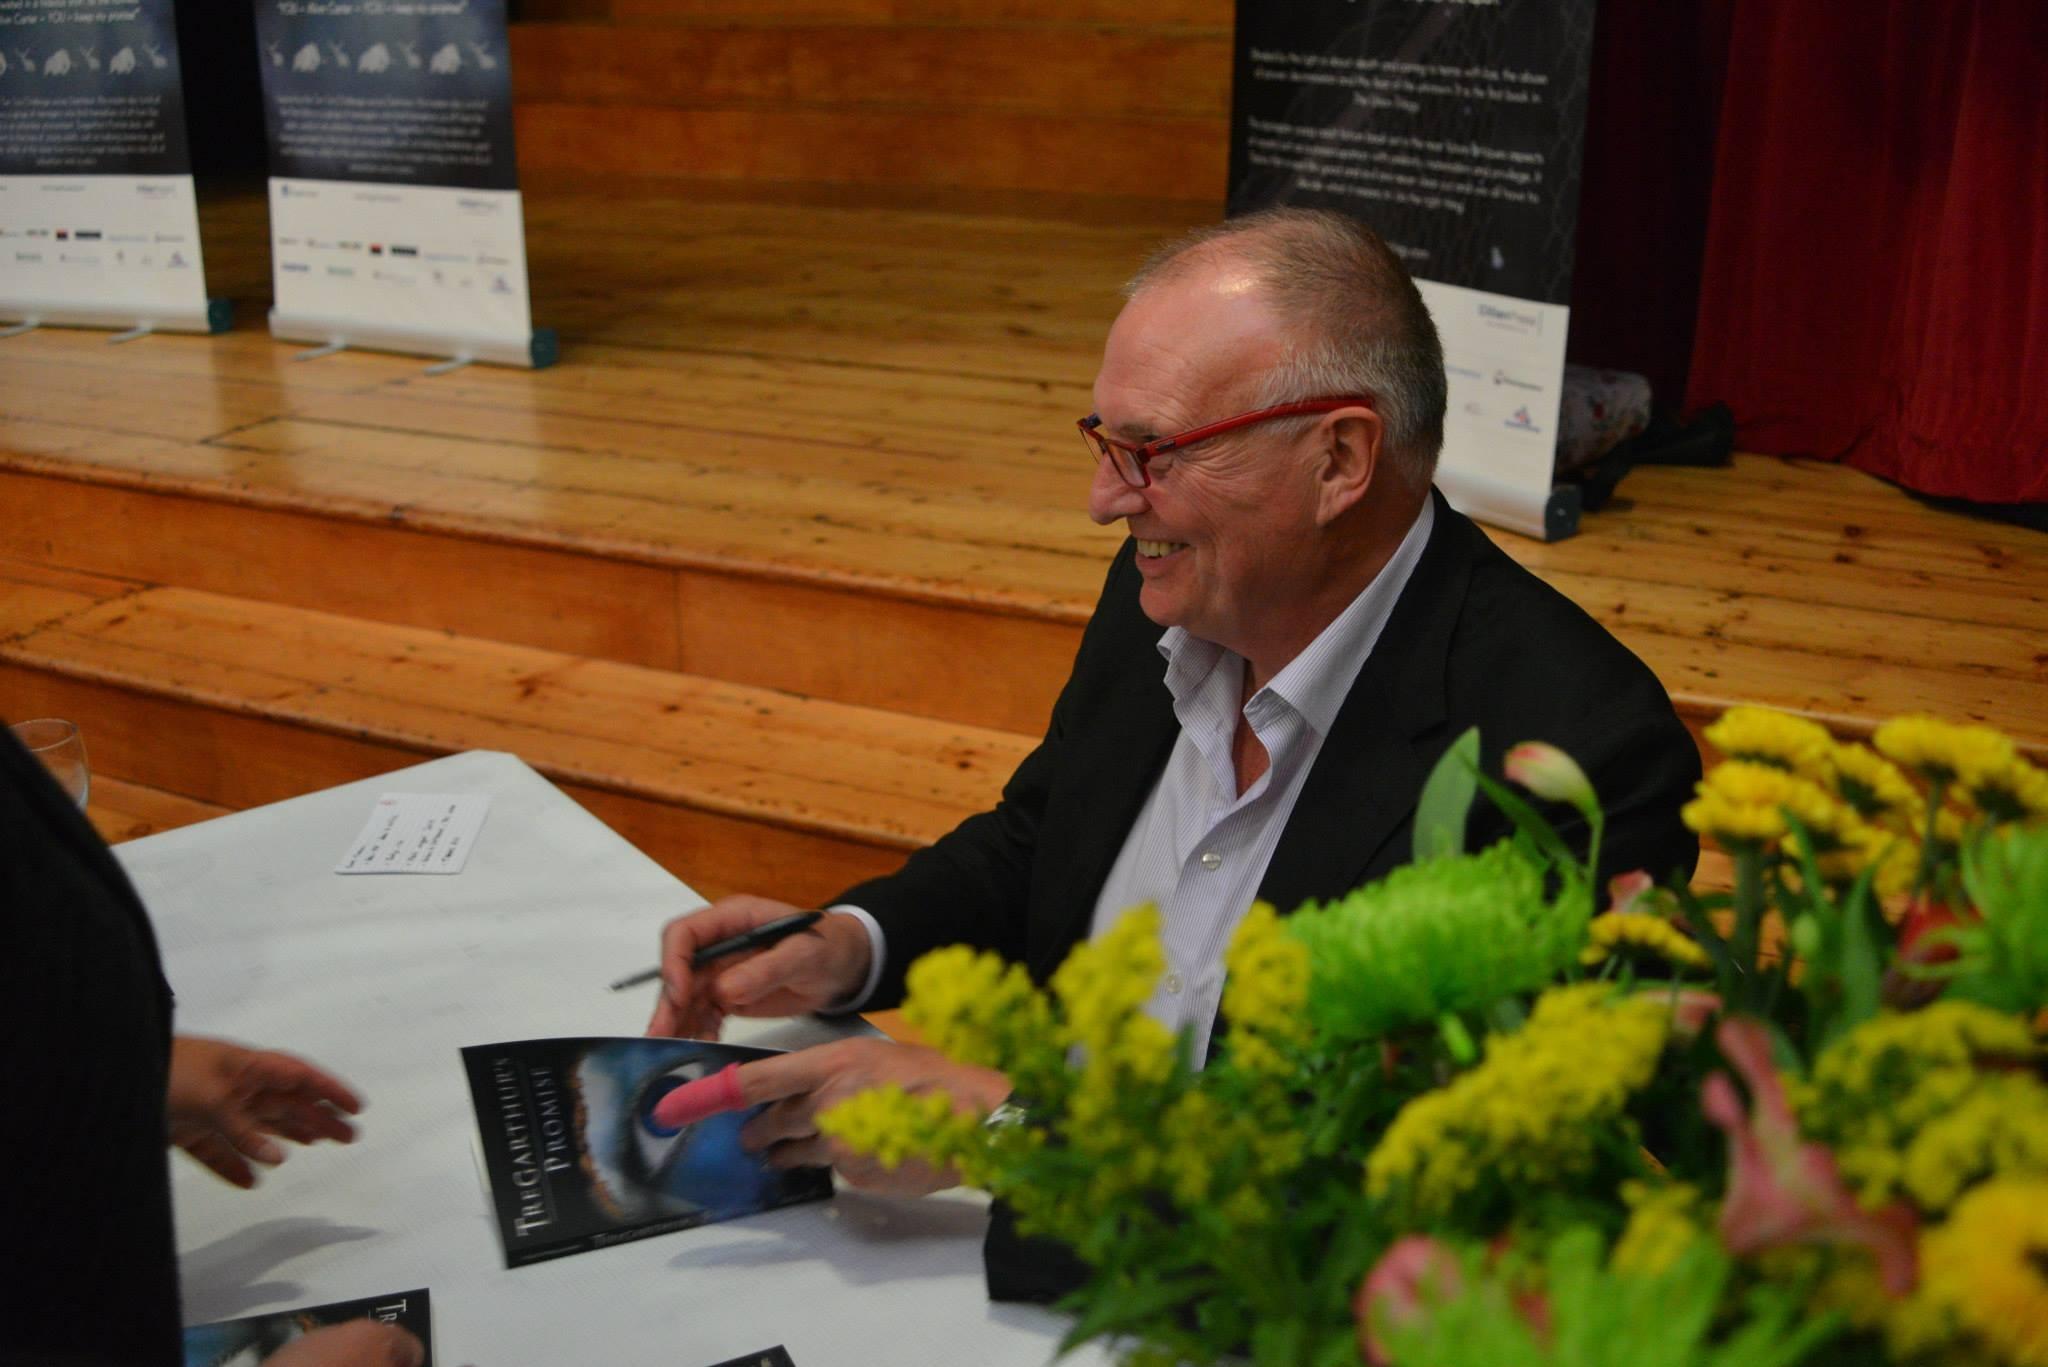 Alex Mellanby - Author of the Tregarthur's Series